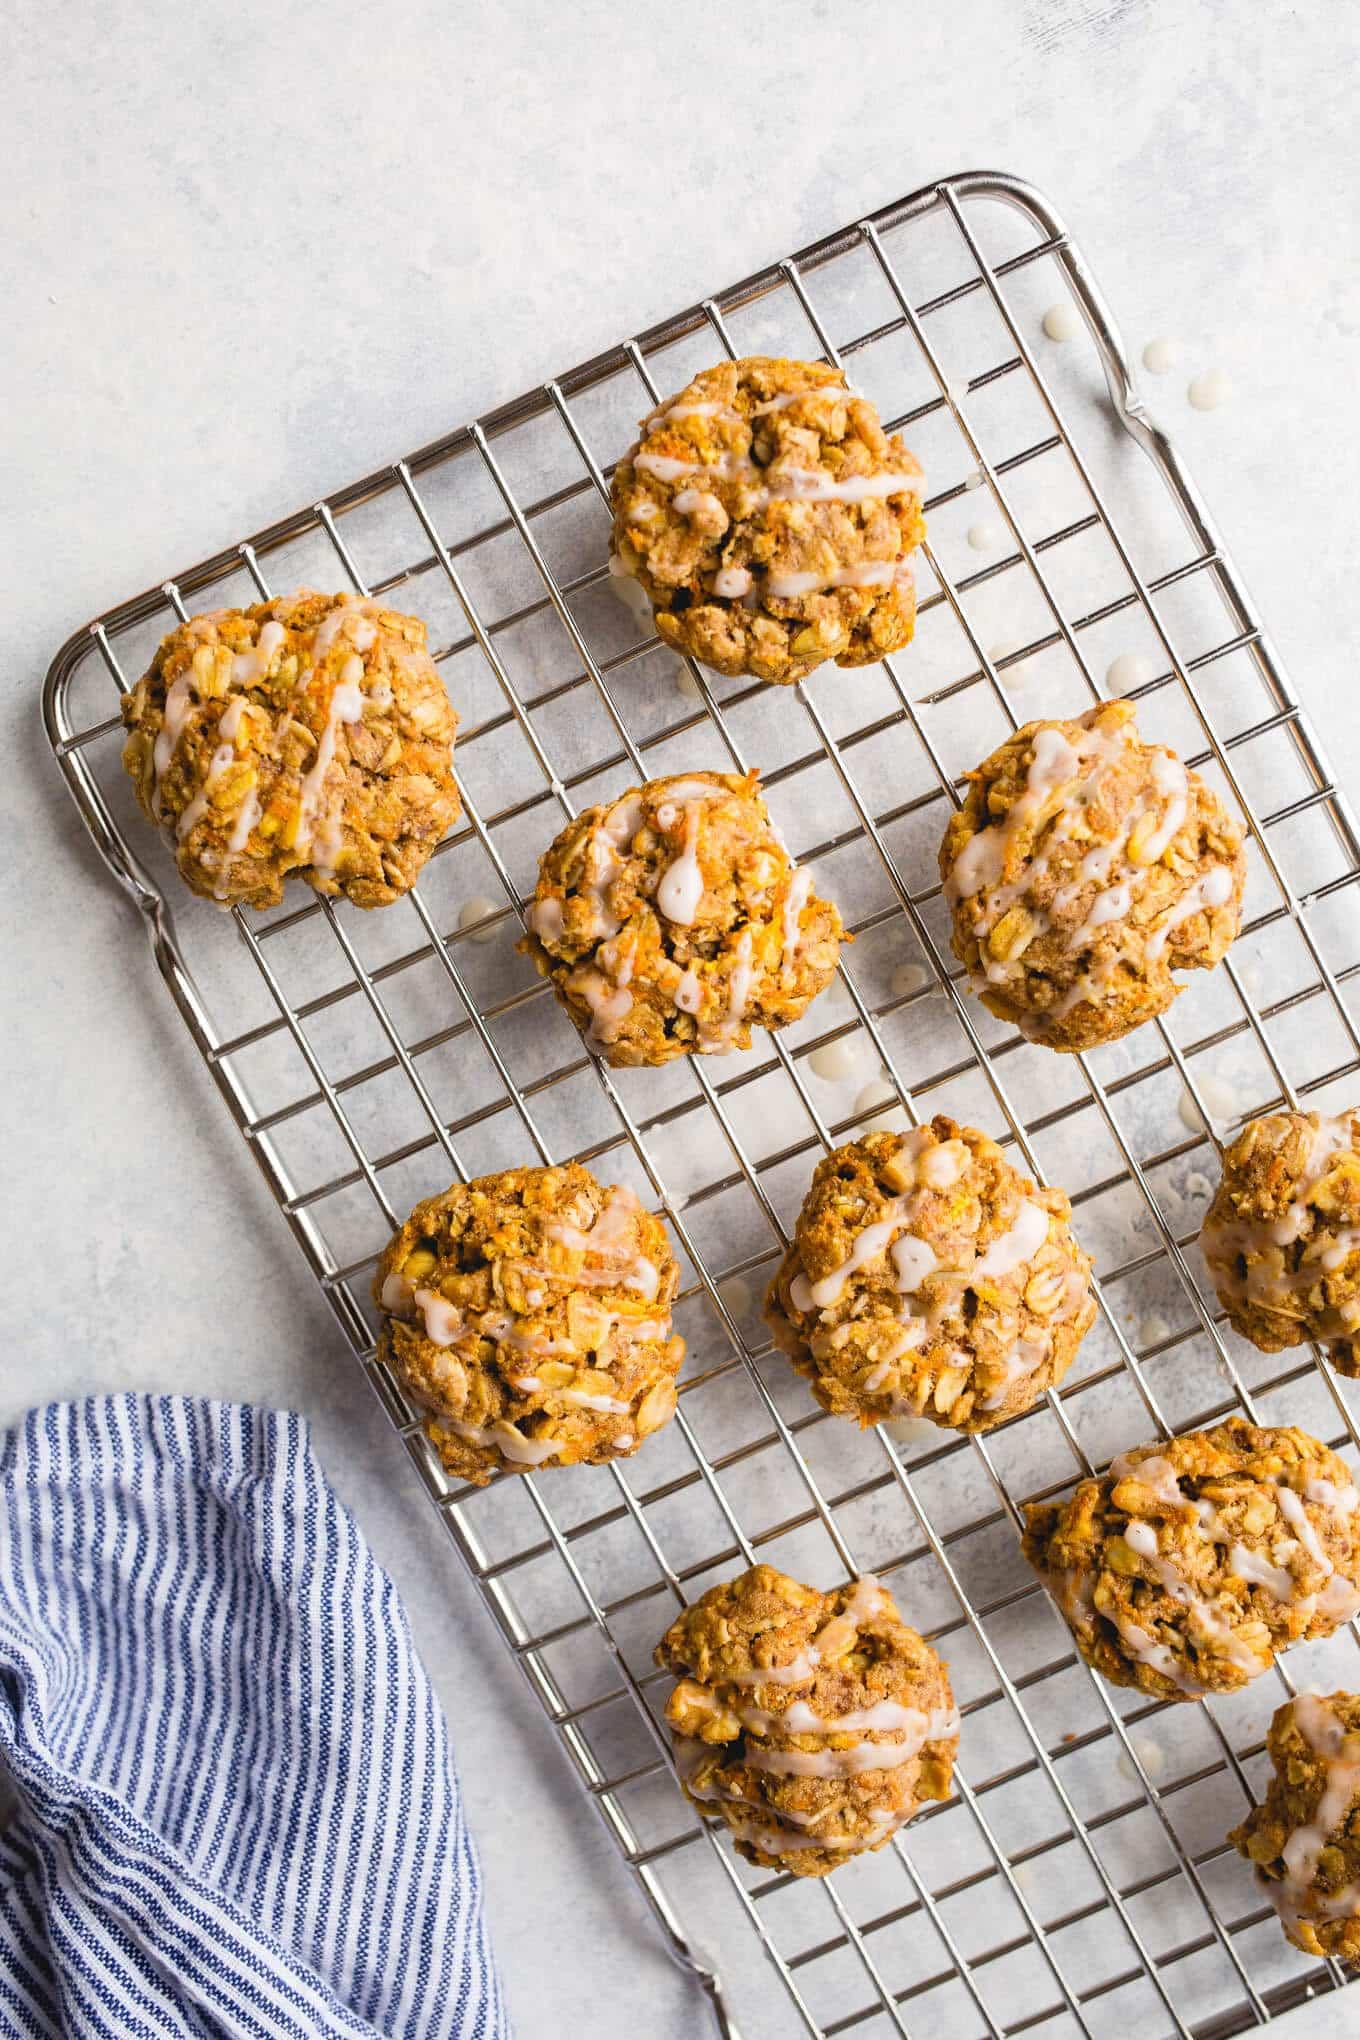 Vegan Carrot Cake Oatmeal Cookies